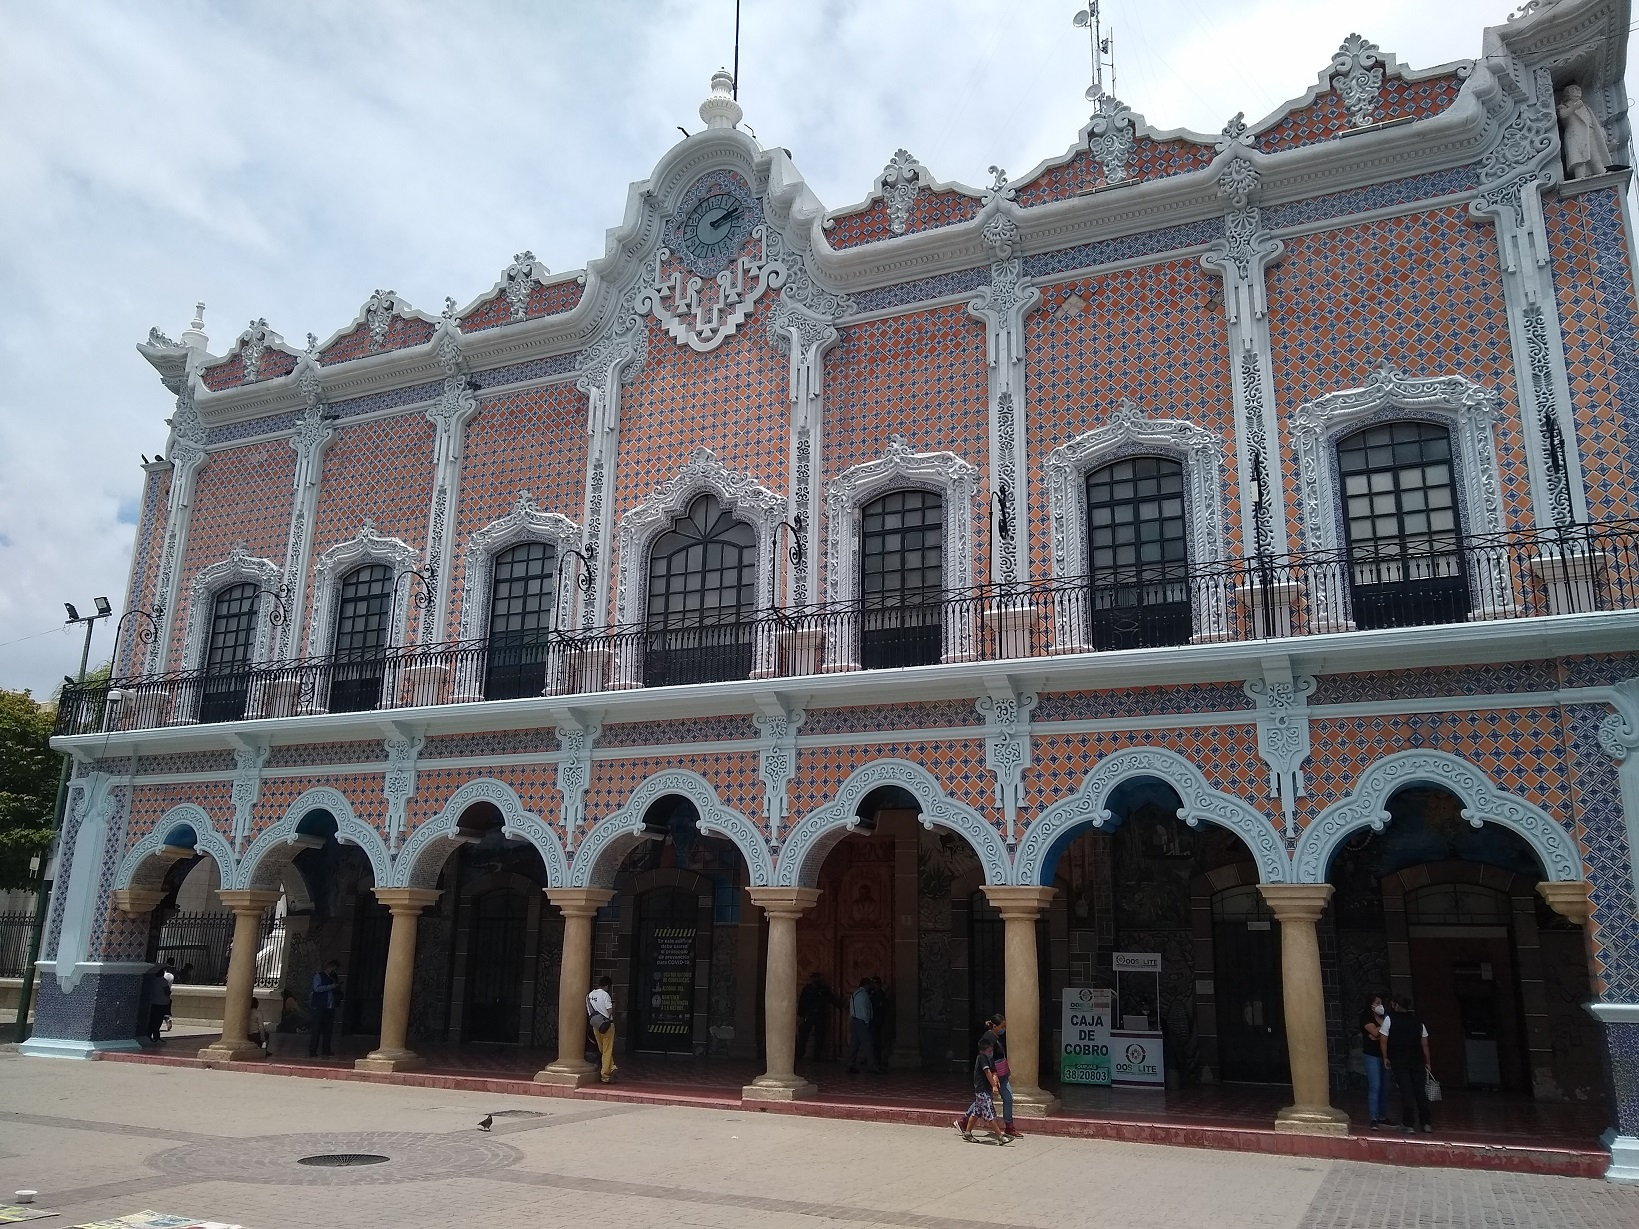 Presenta edil de Tehuacán recurso ante la SCJN para evitar destitución